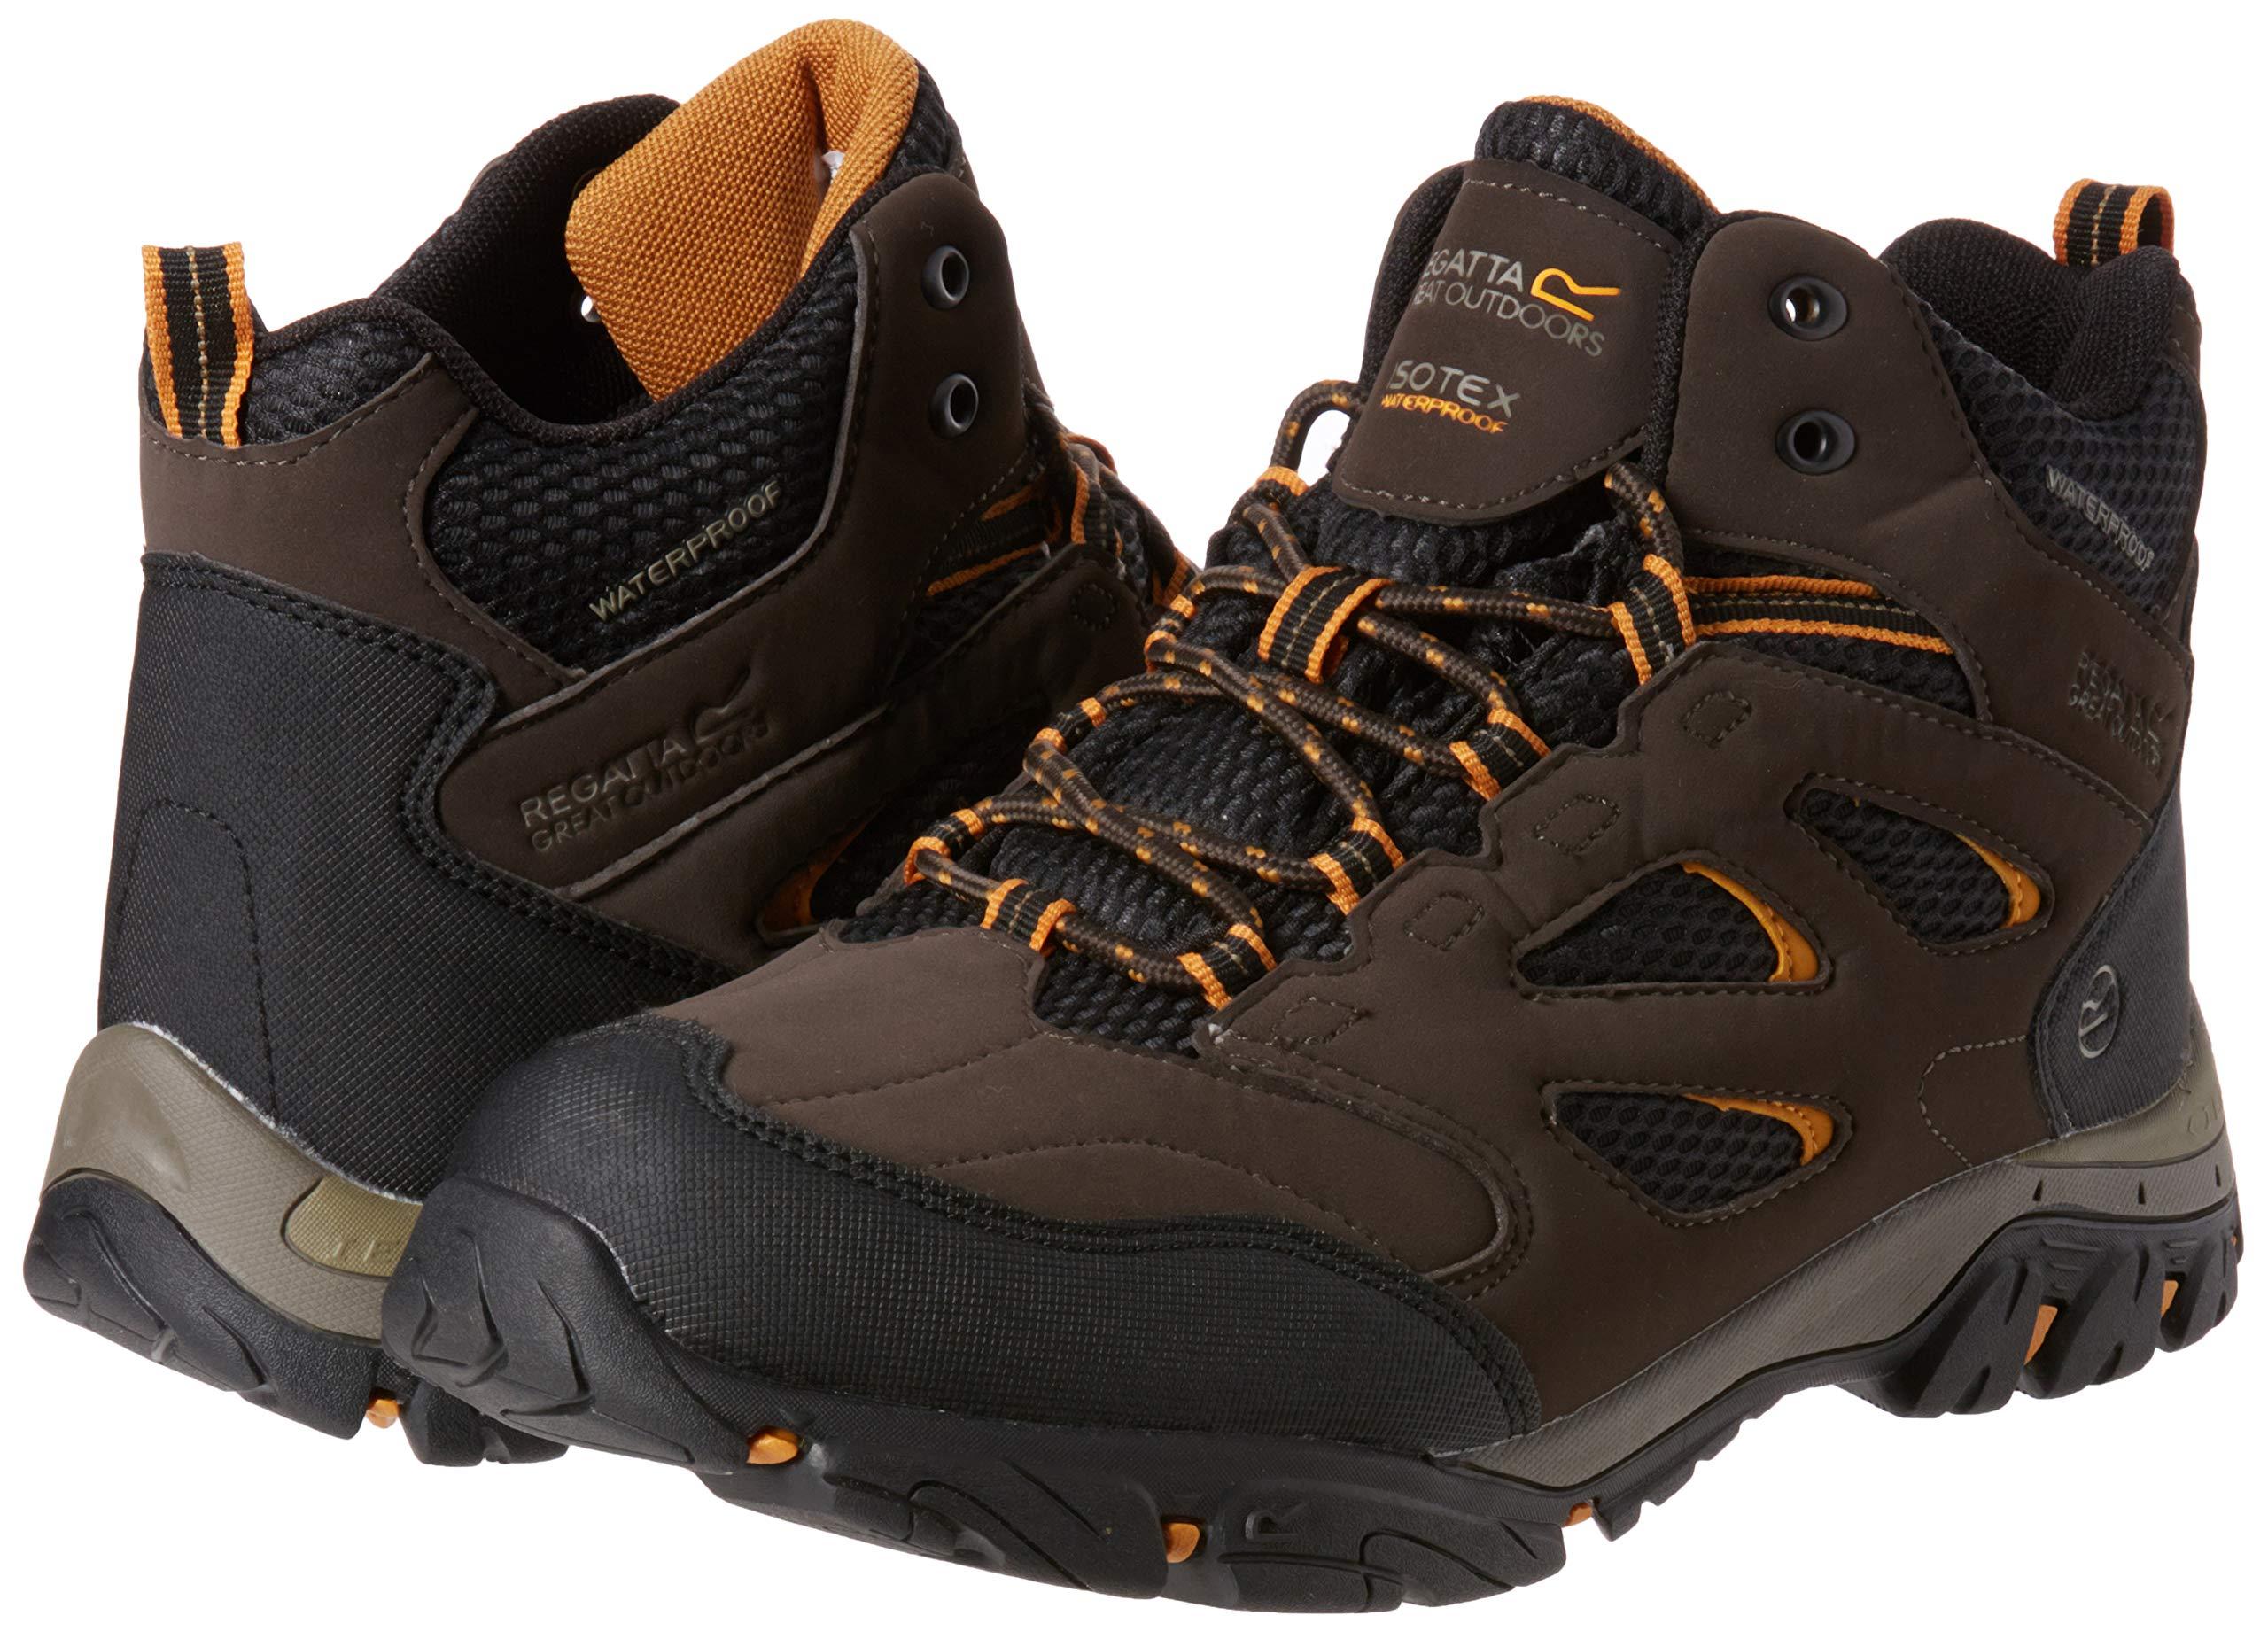 Regatta Men's Holcombe IEP Mid High Rise Hiking Boots 5